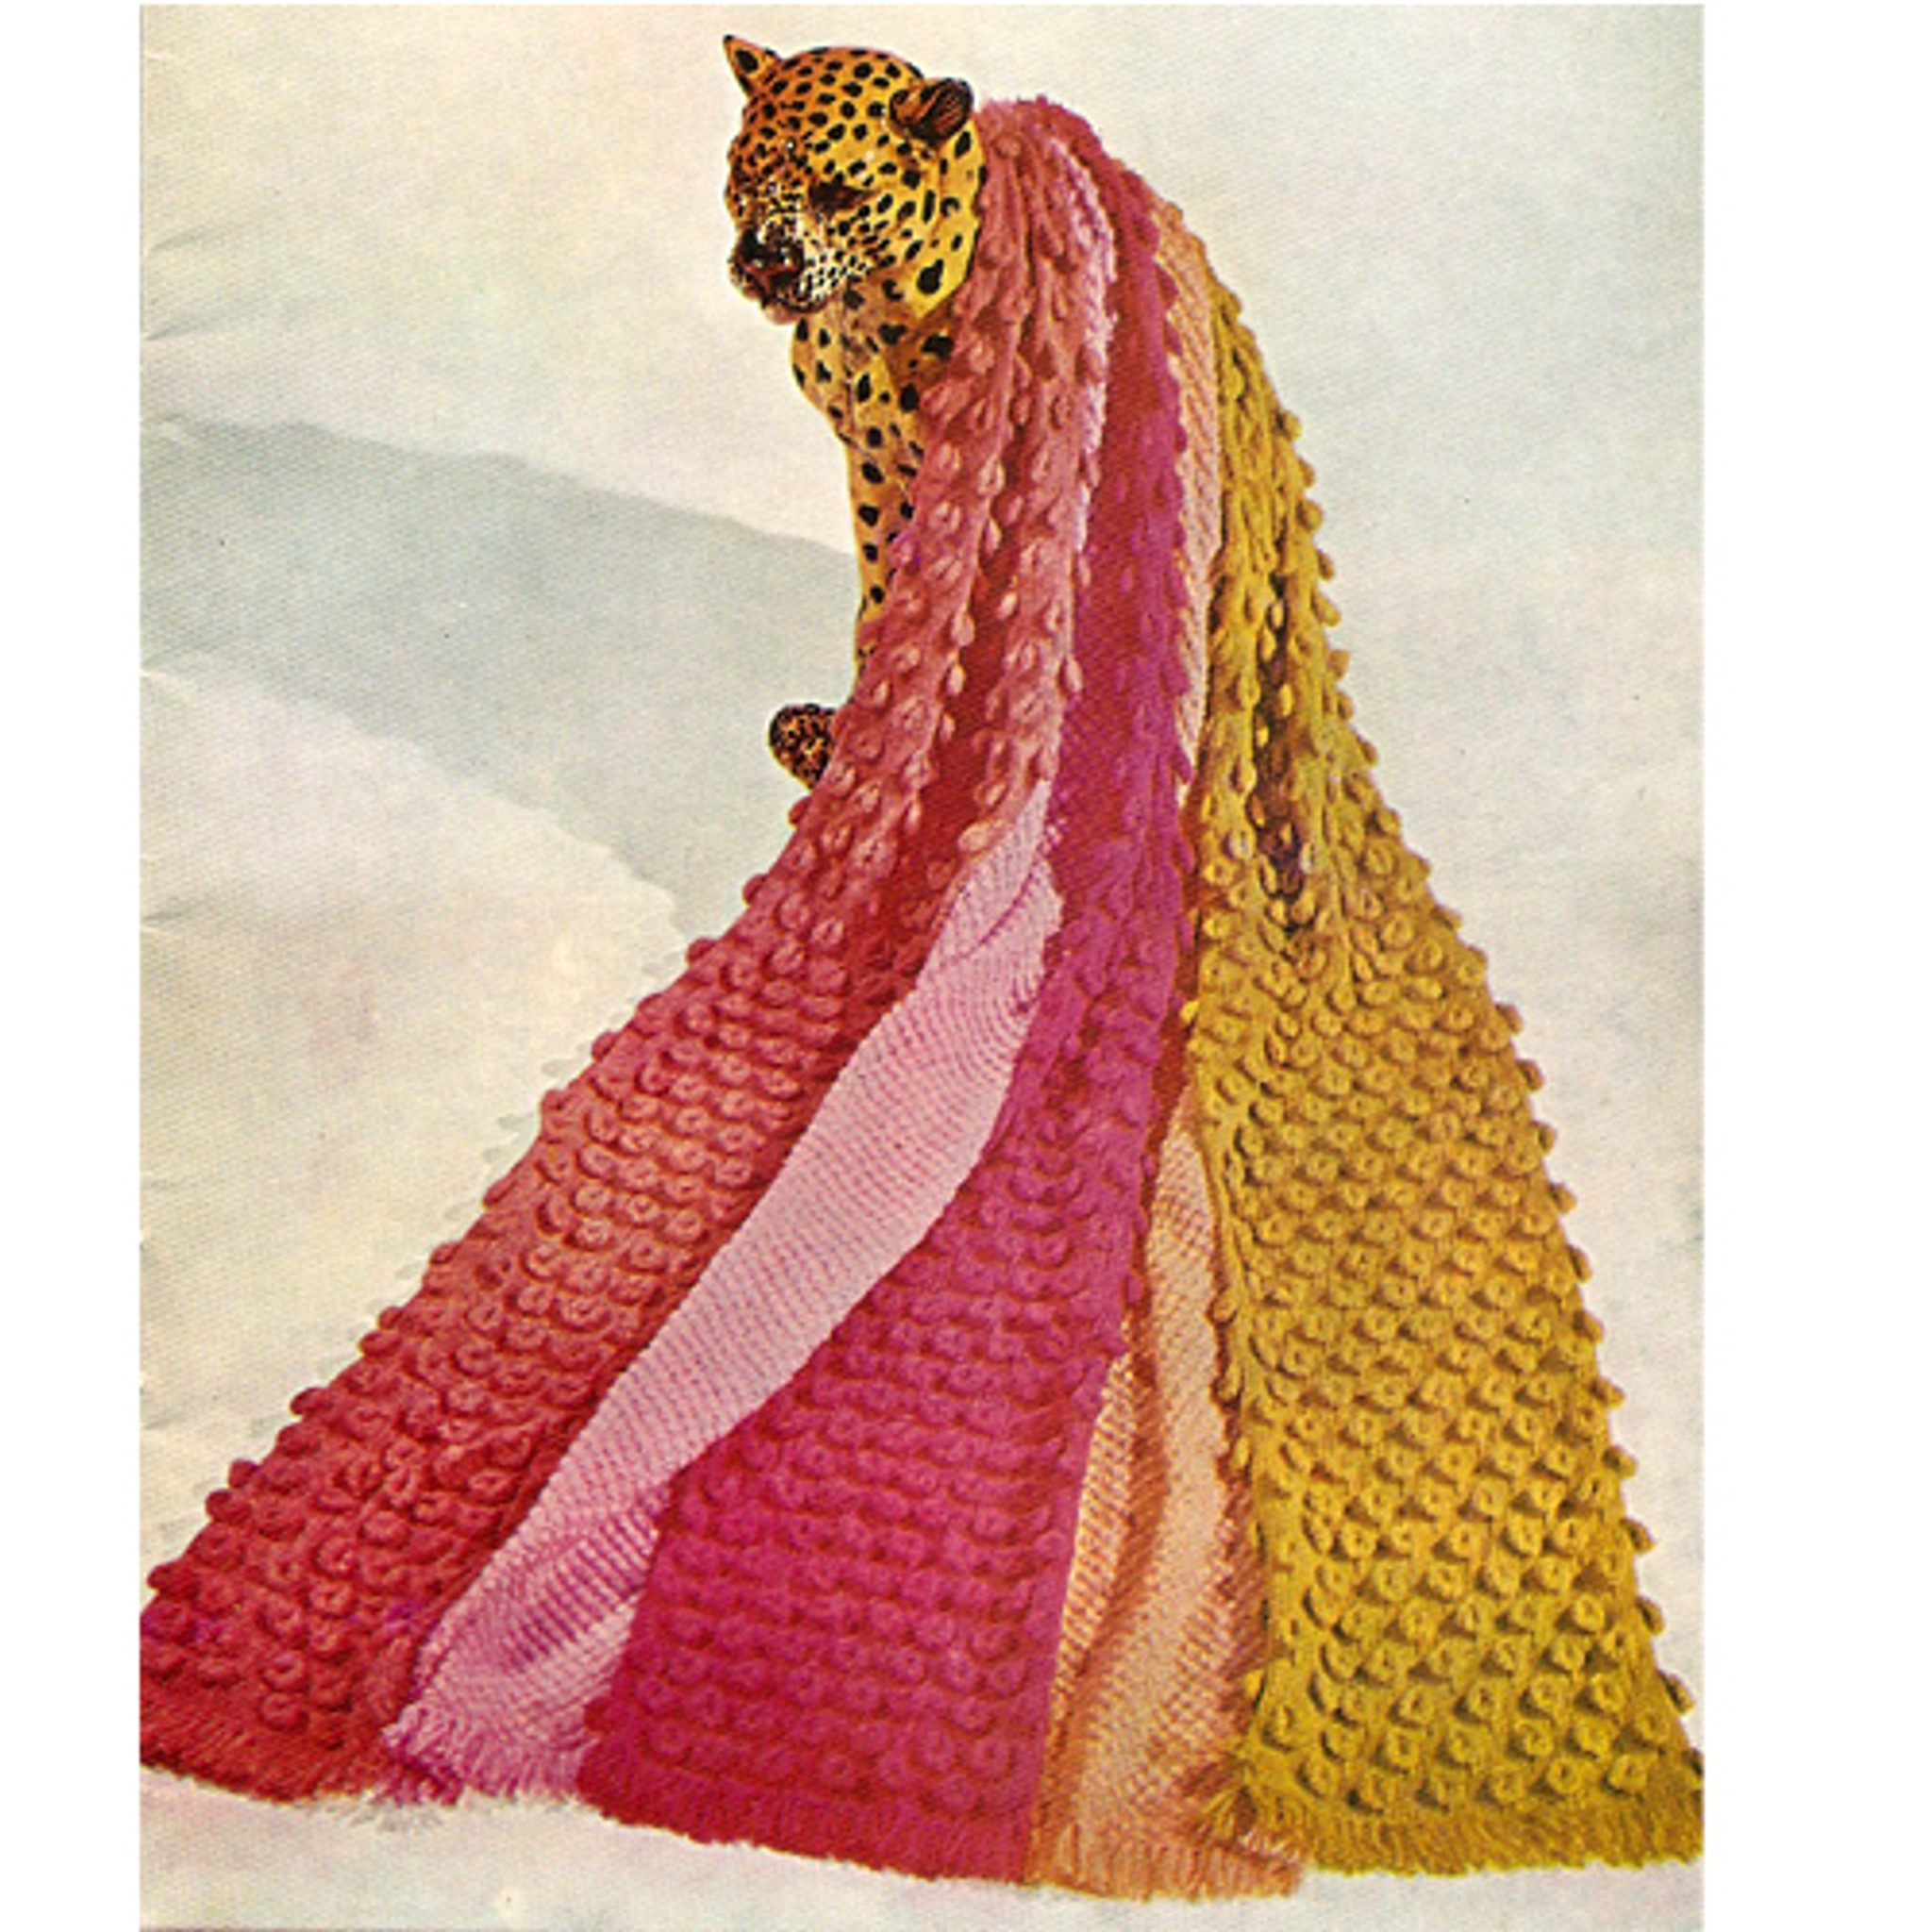 Panel Crochet Afghan Pattern in Popcorn Stitch